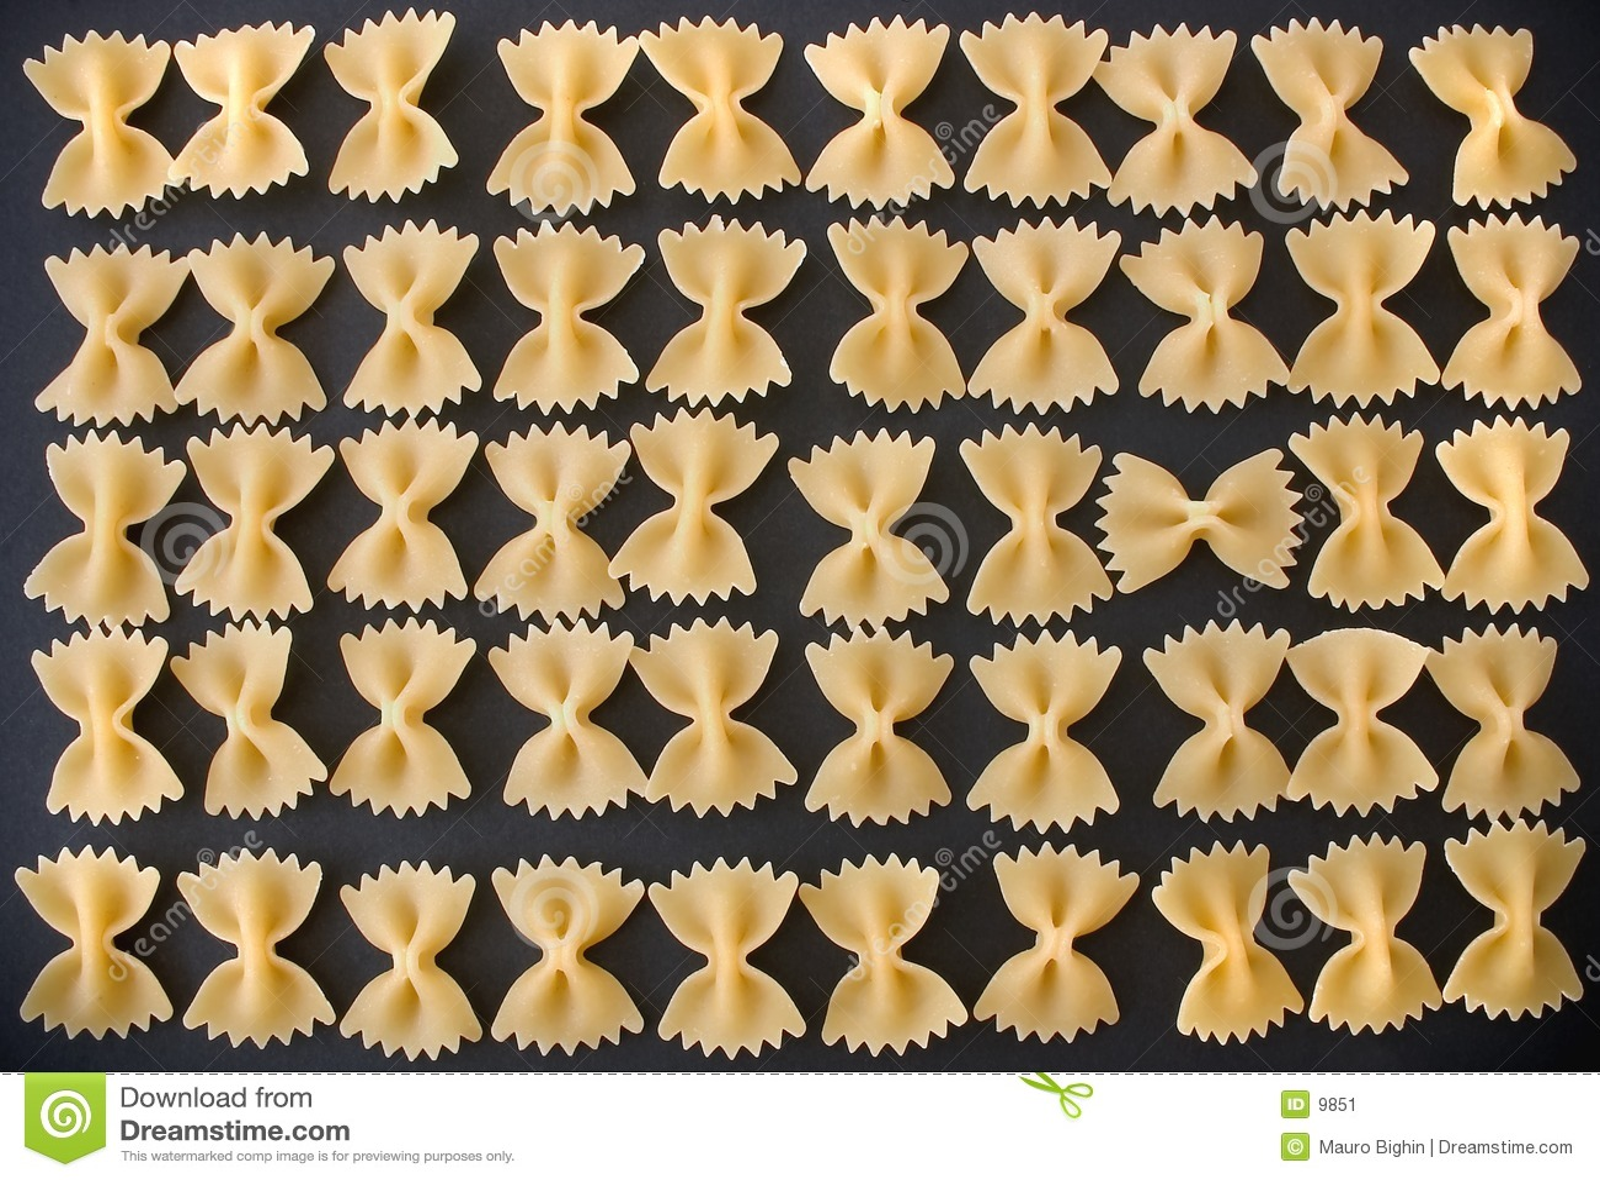 Pasta parade - macaroni